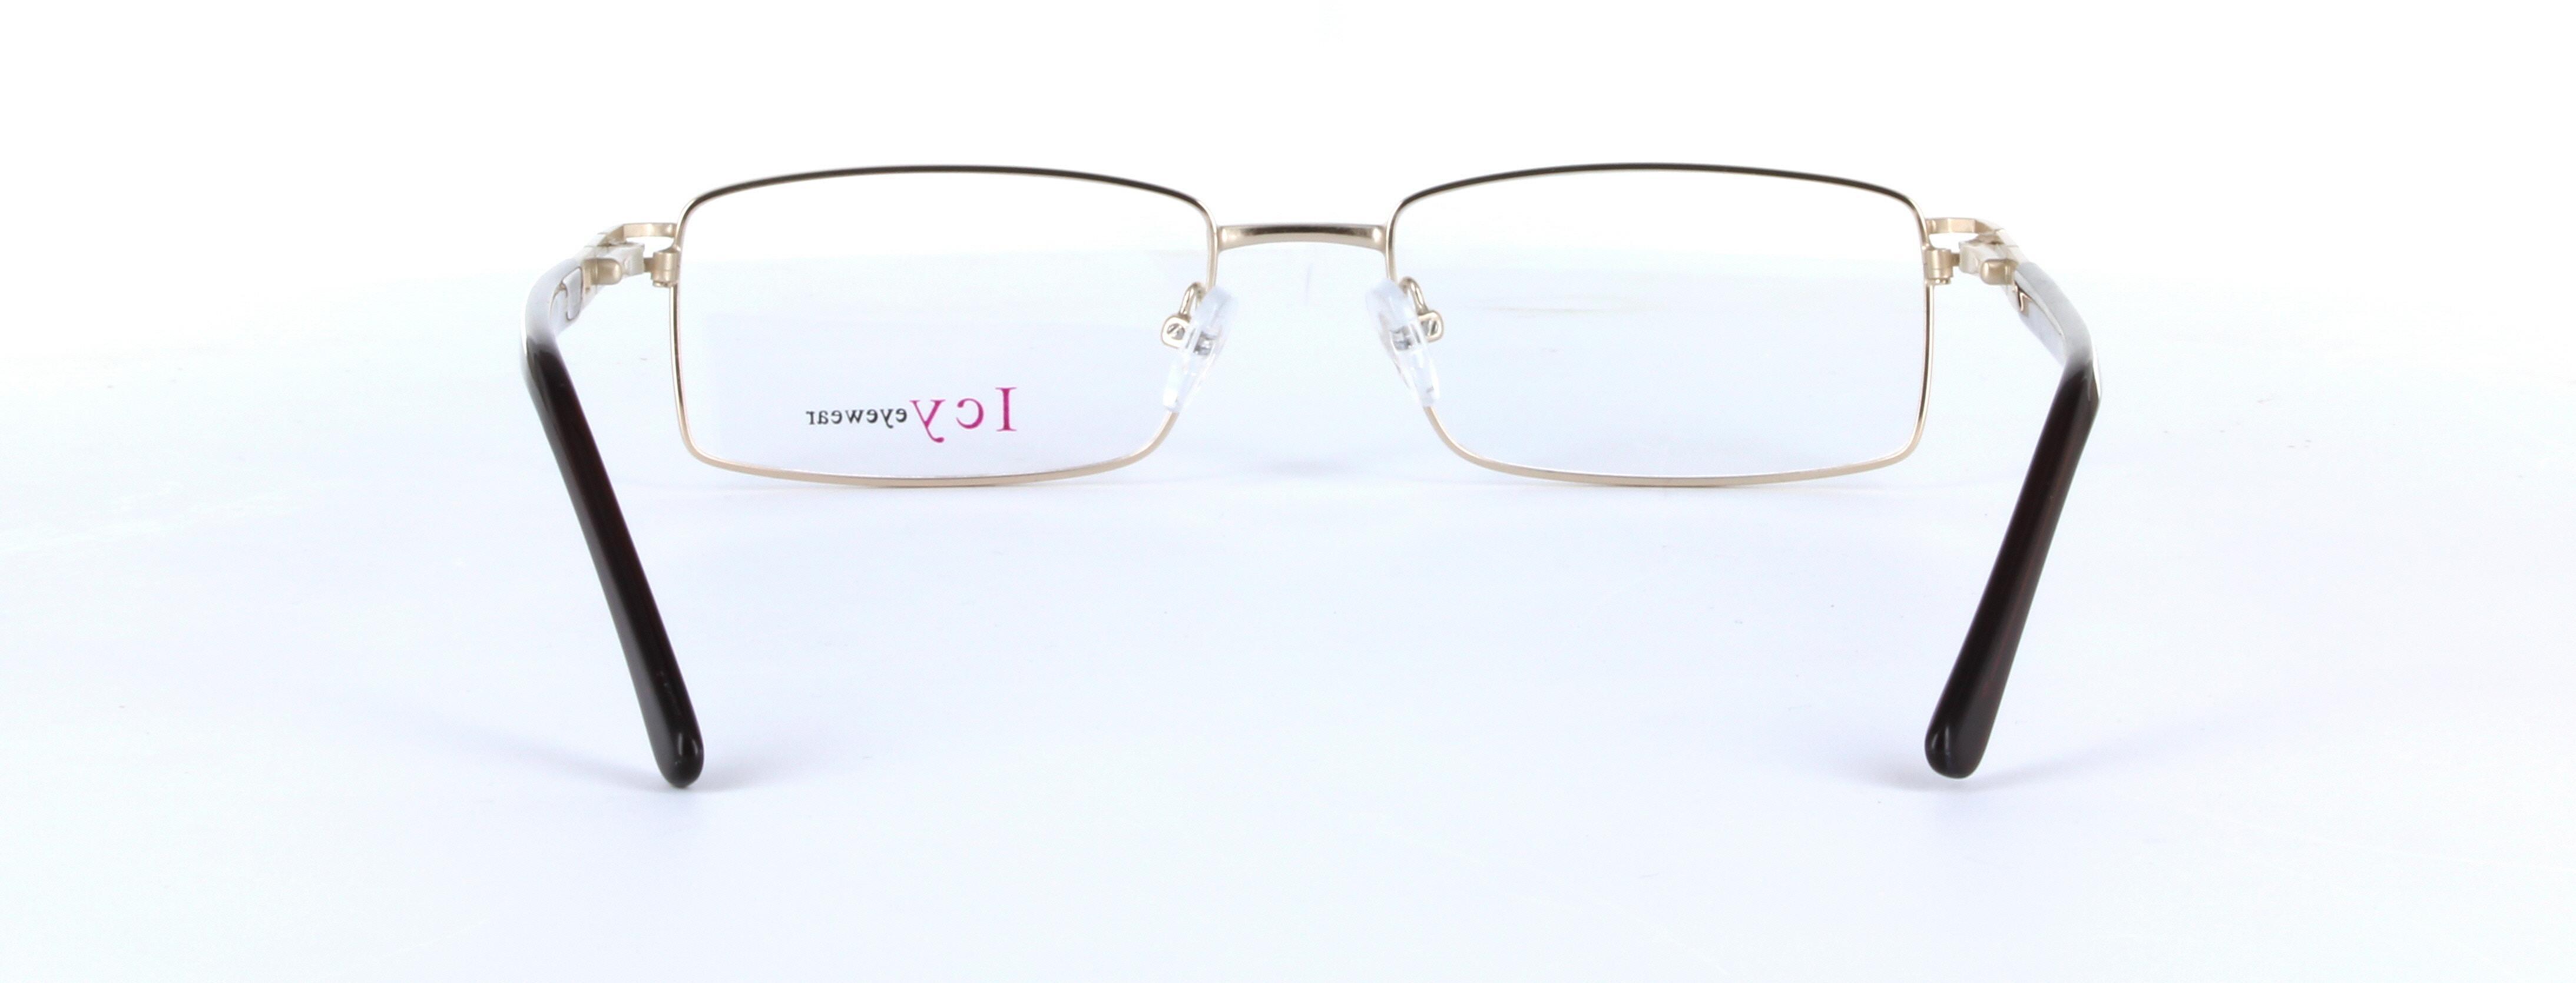 48afe683ecc Robin - Classic Metal Unisex Prescription Glasses - Gold